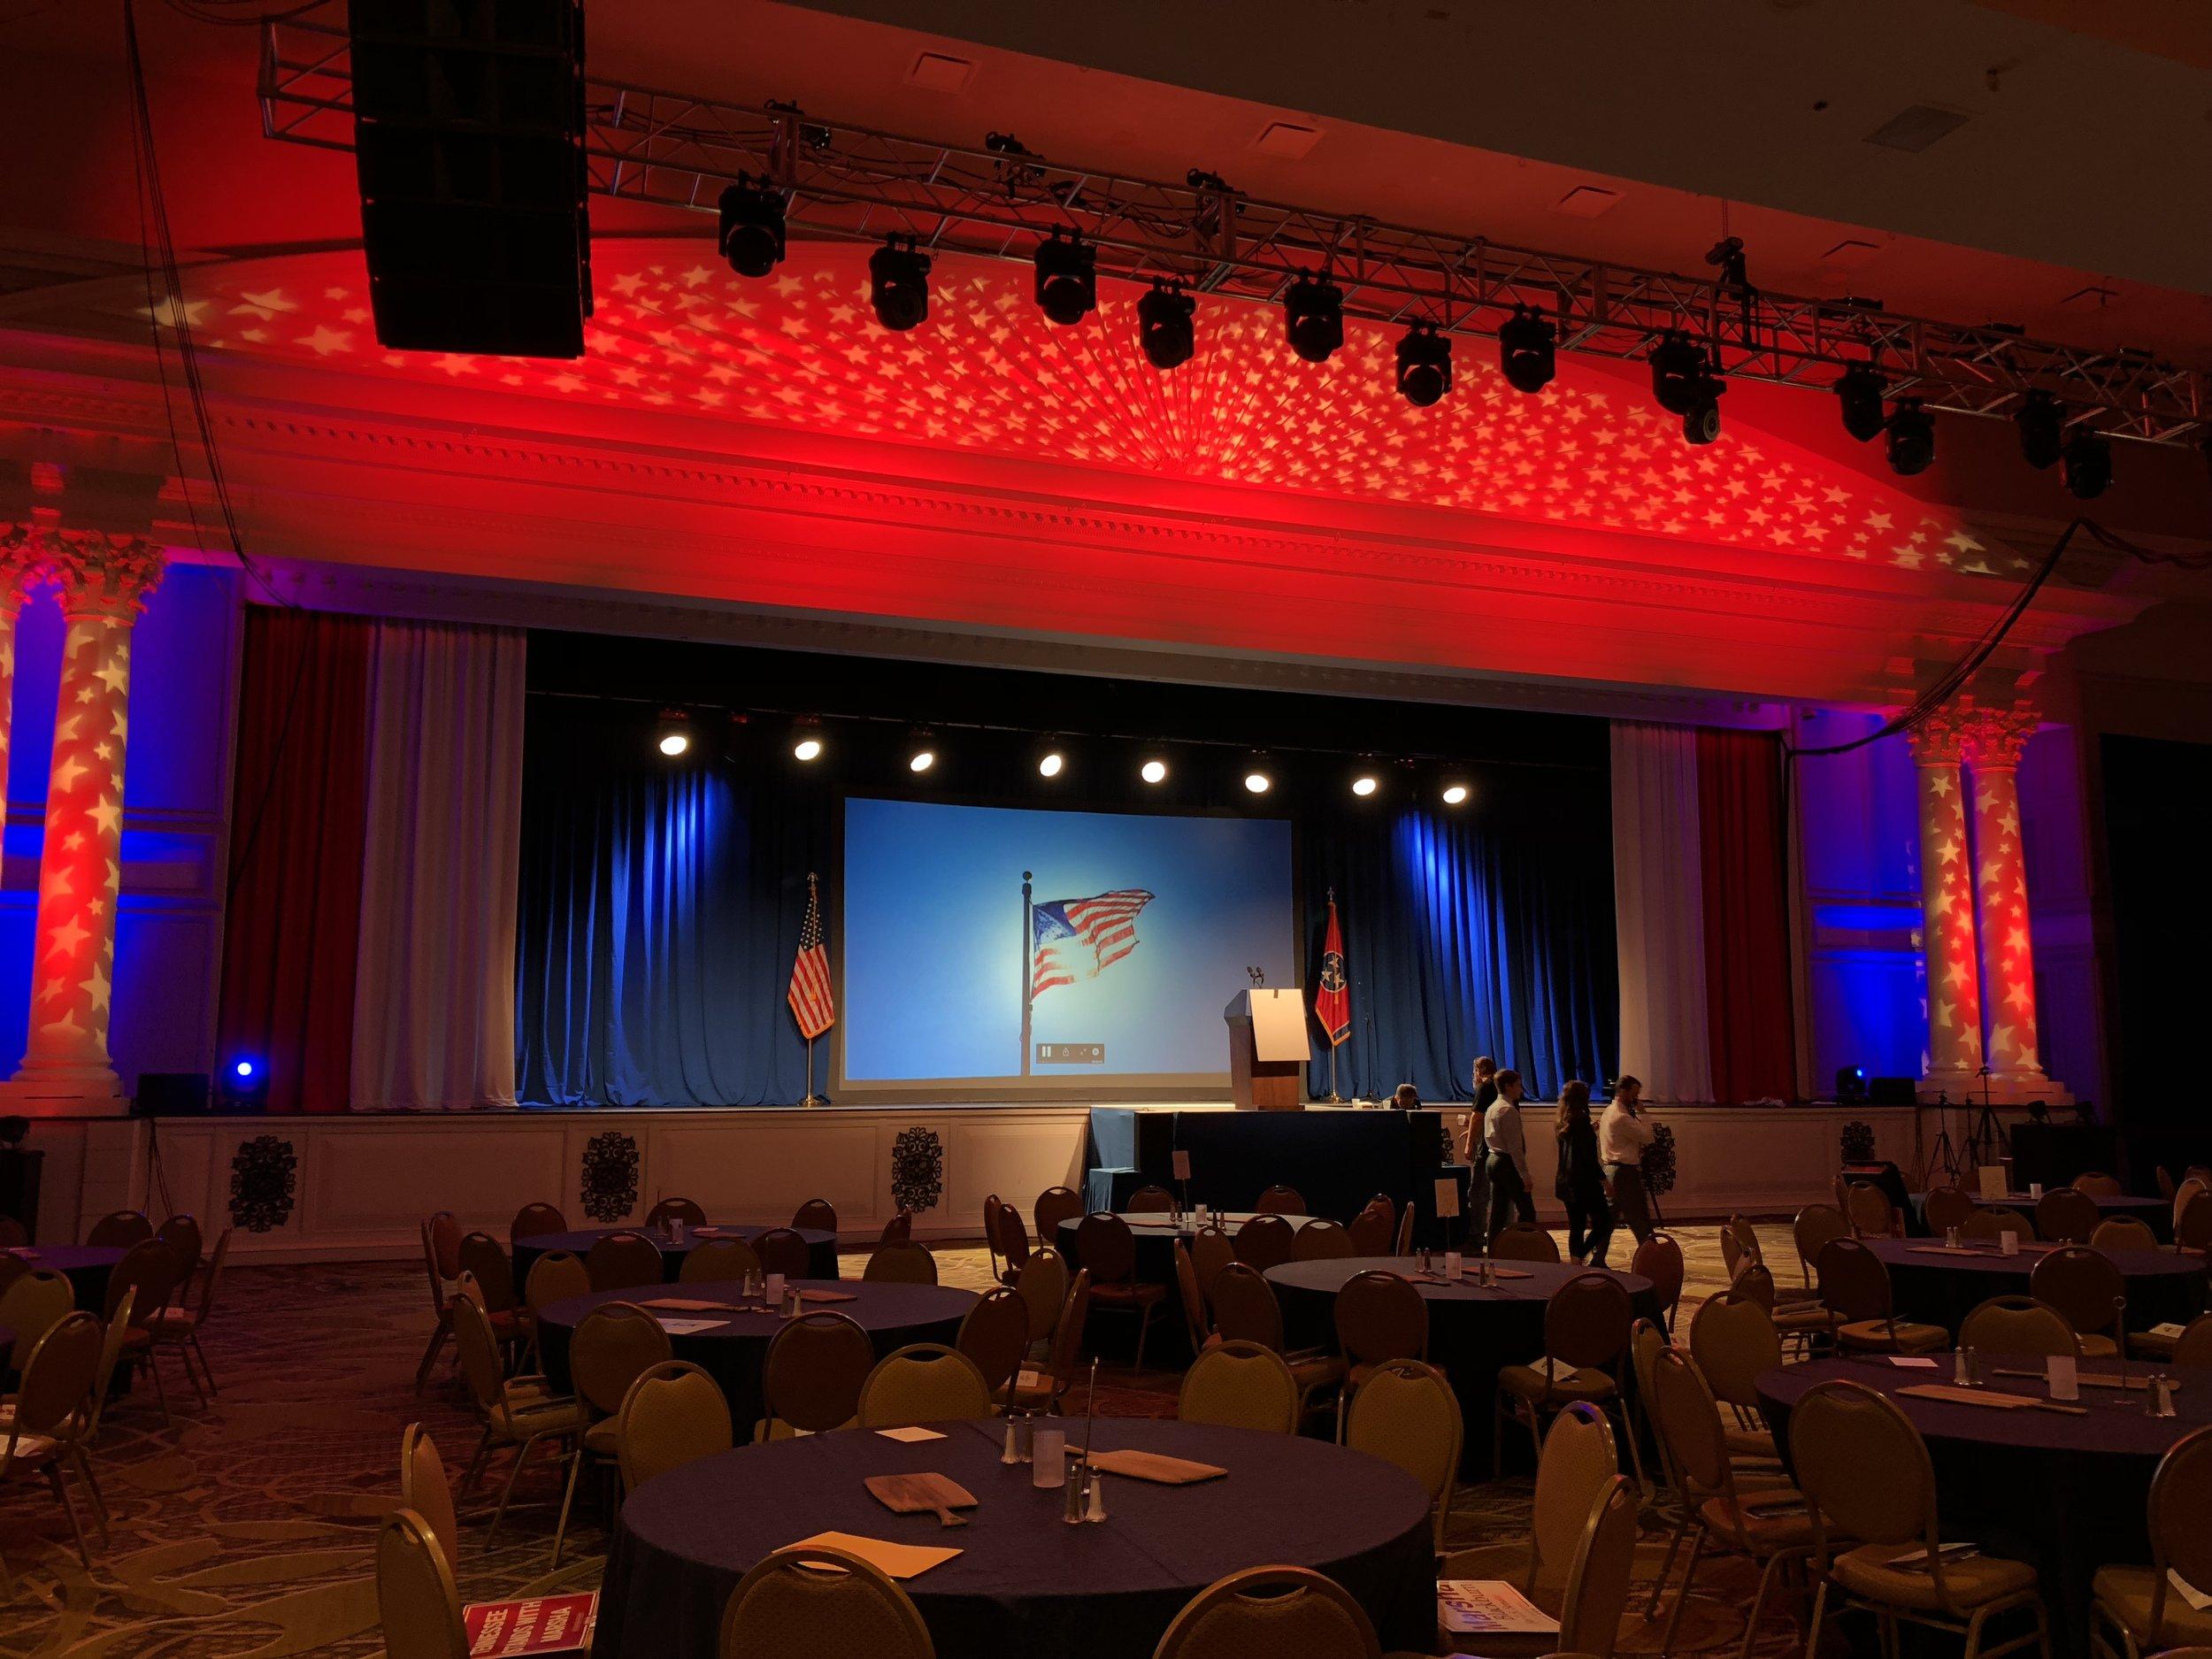 Statesmen's Dinner 2018  Gaylord Opryland Hotel, Nashville, TN